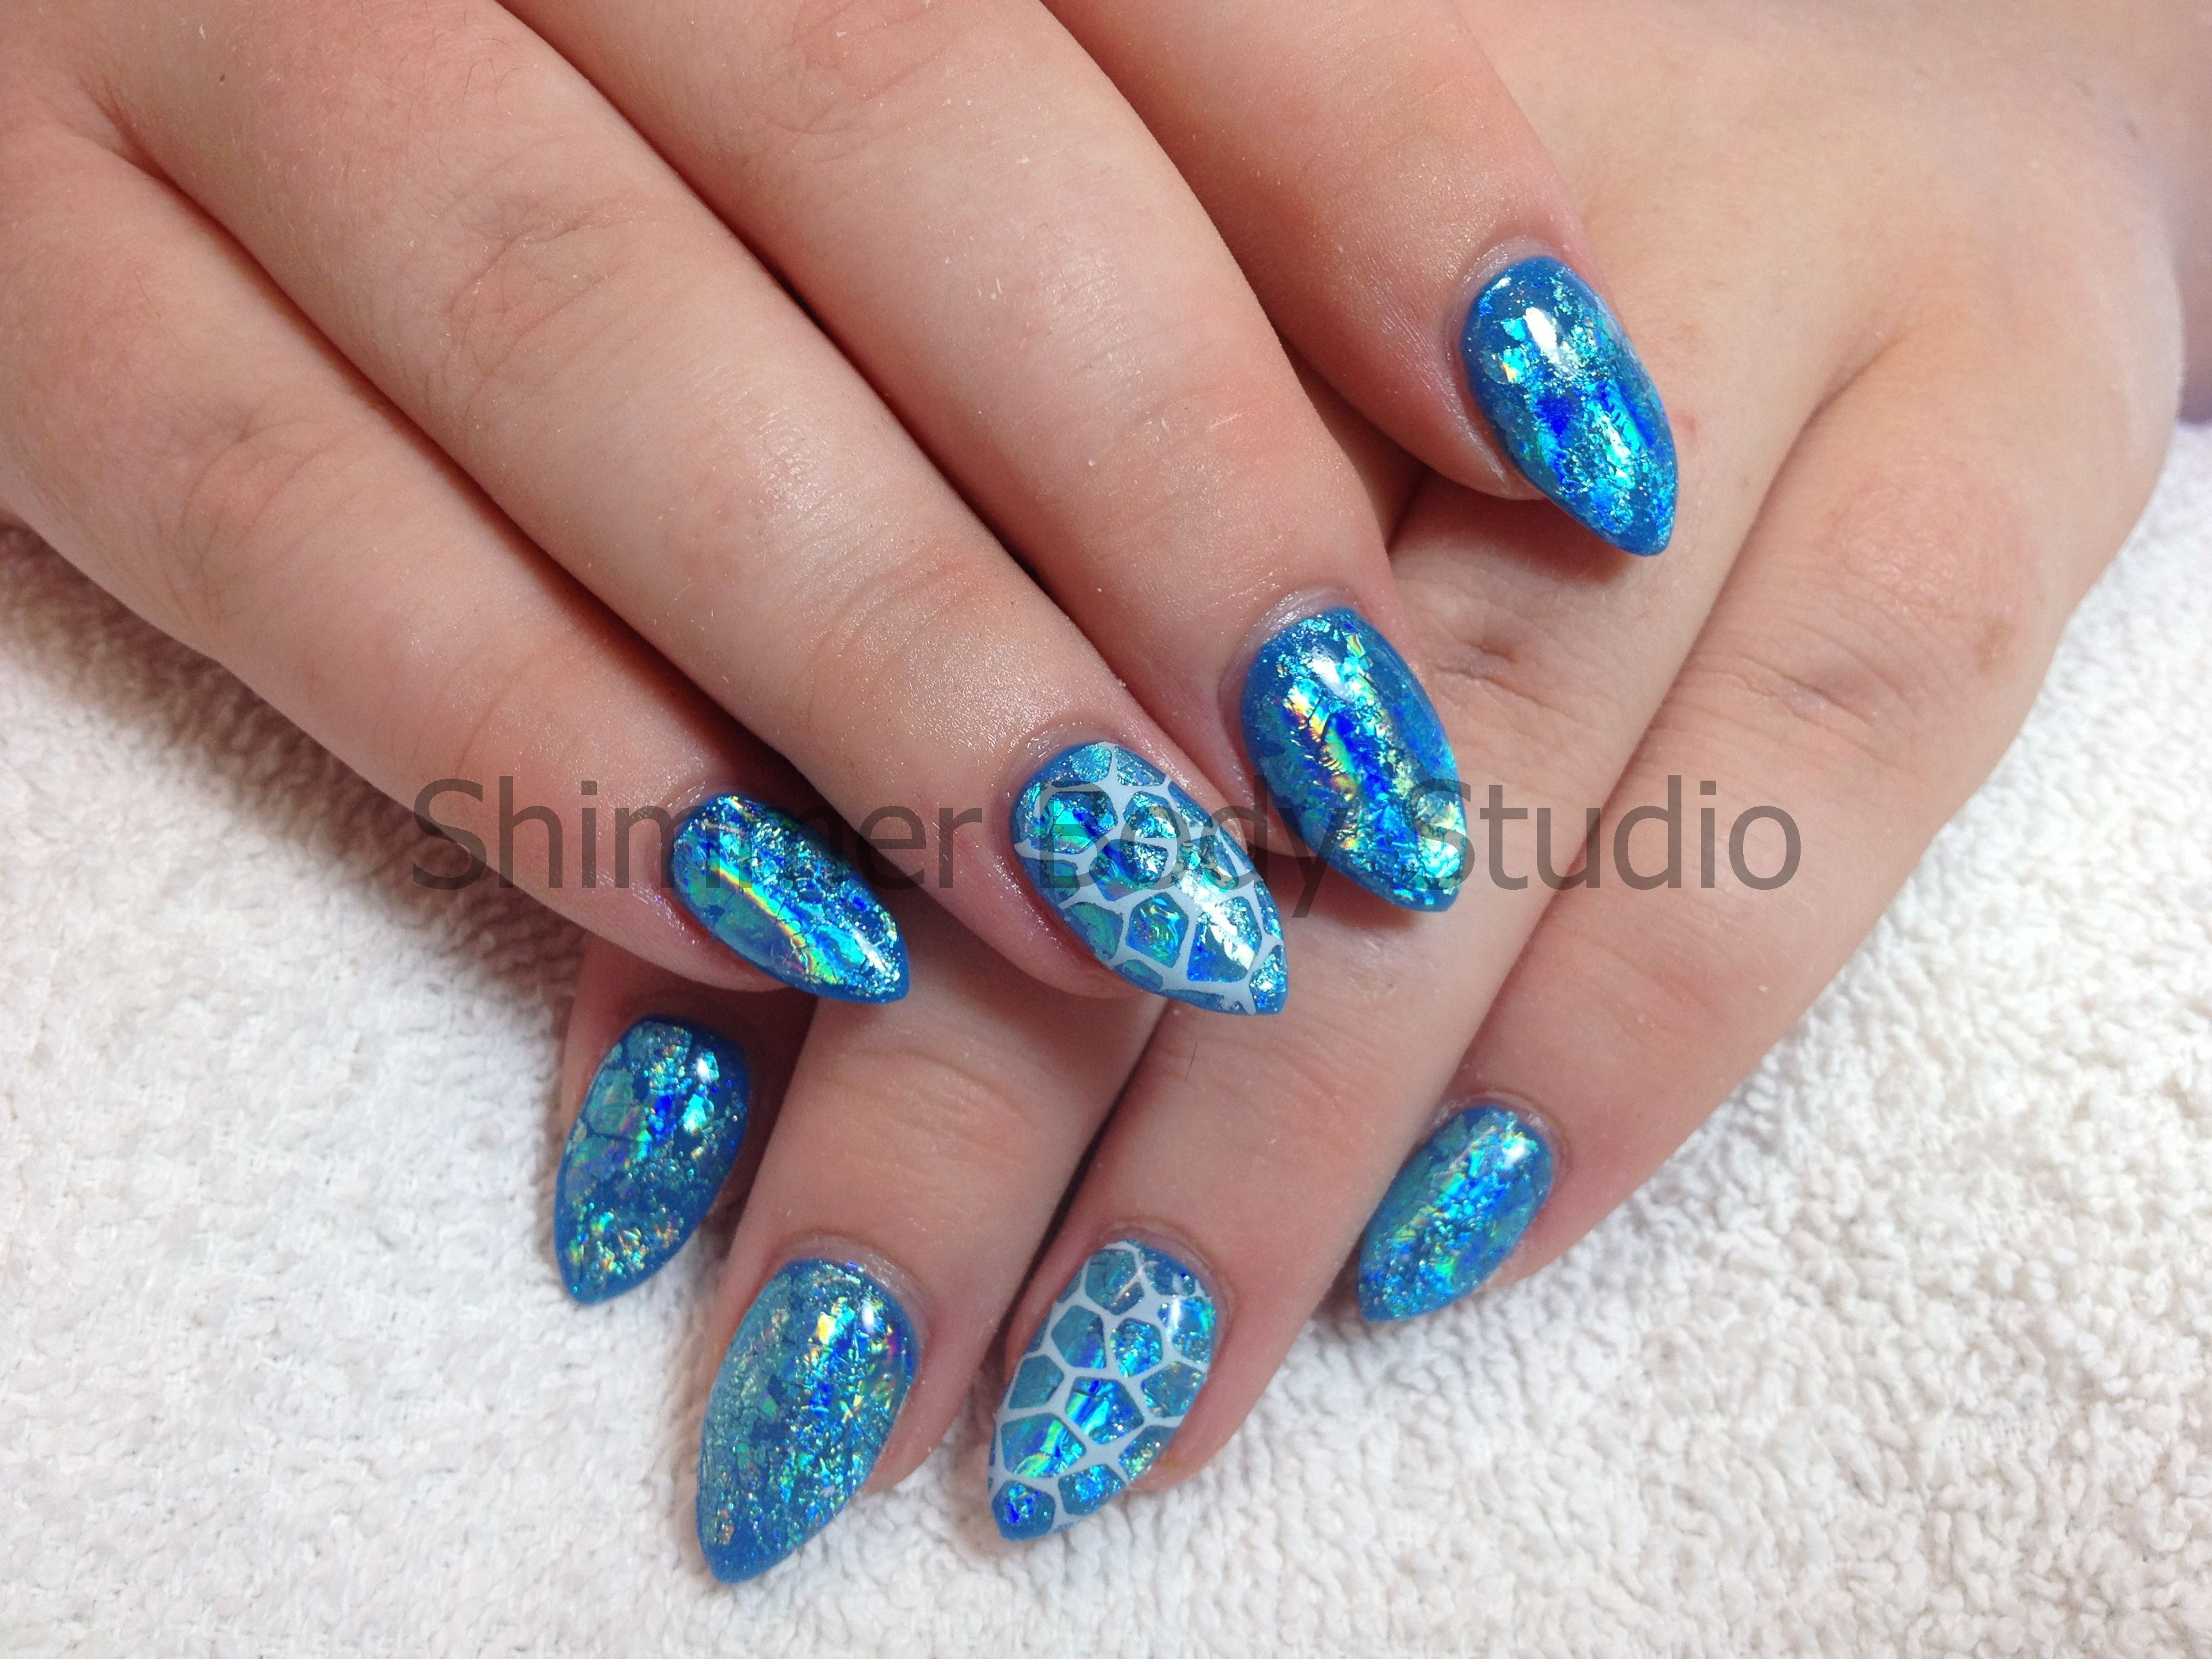 Gel nails, pointed almond nails, blue glitter foil nails, konad ...